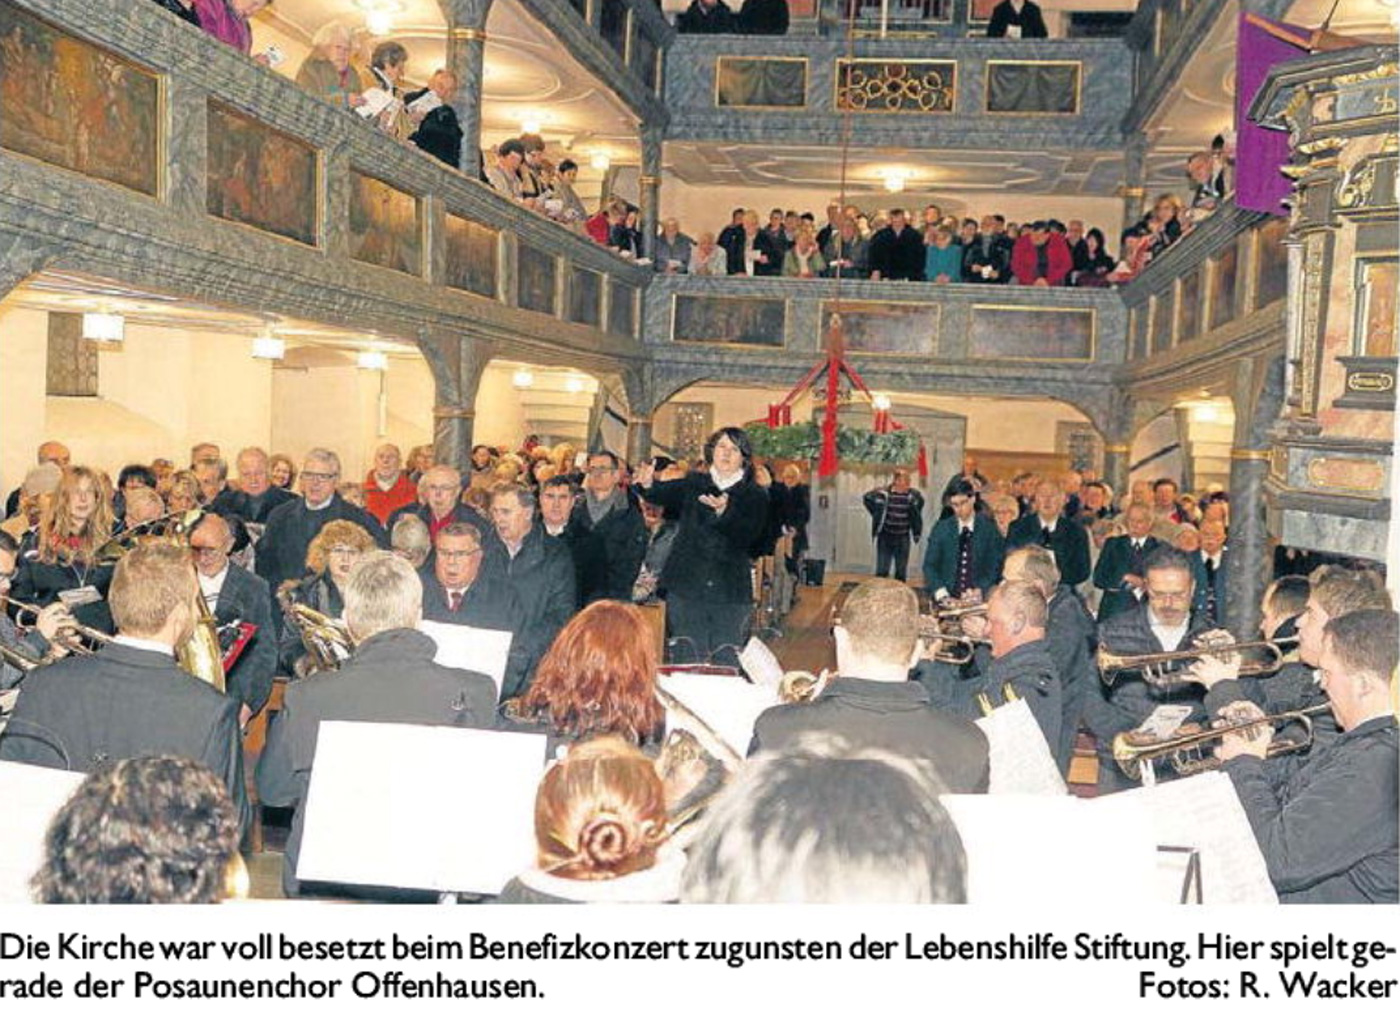 DieKirchewar voll besetzt beim Benefizkonzert zugunsten der LebenshilfeStiftung.Hier spielt gerade der Posaunenchor Offenhausen. Fotos: R. Wacker